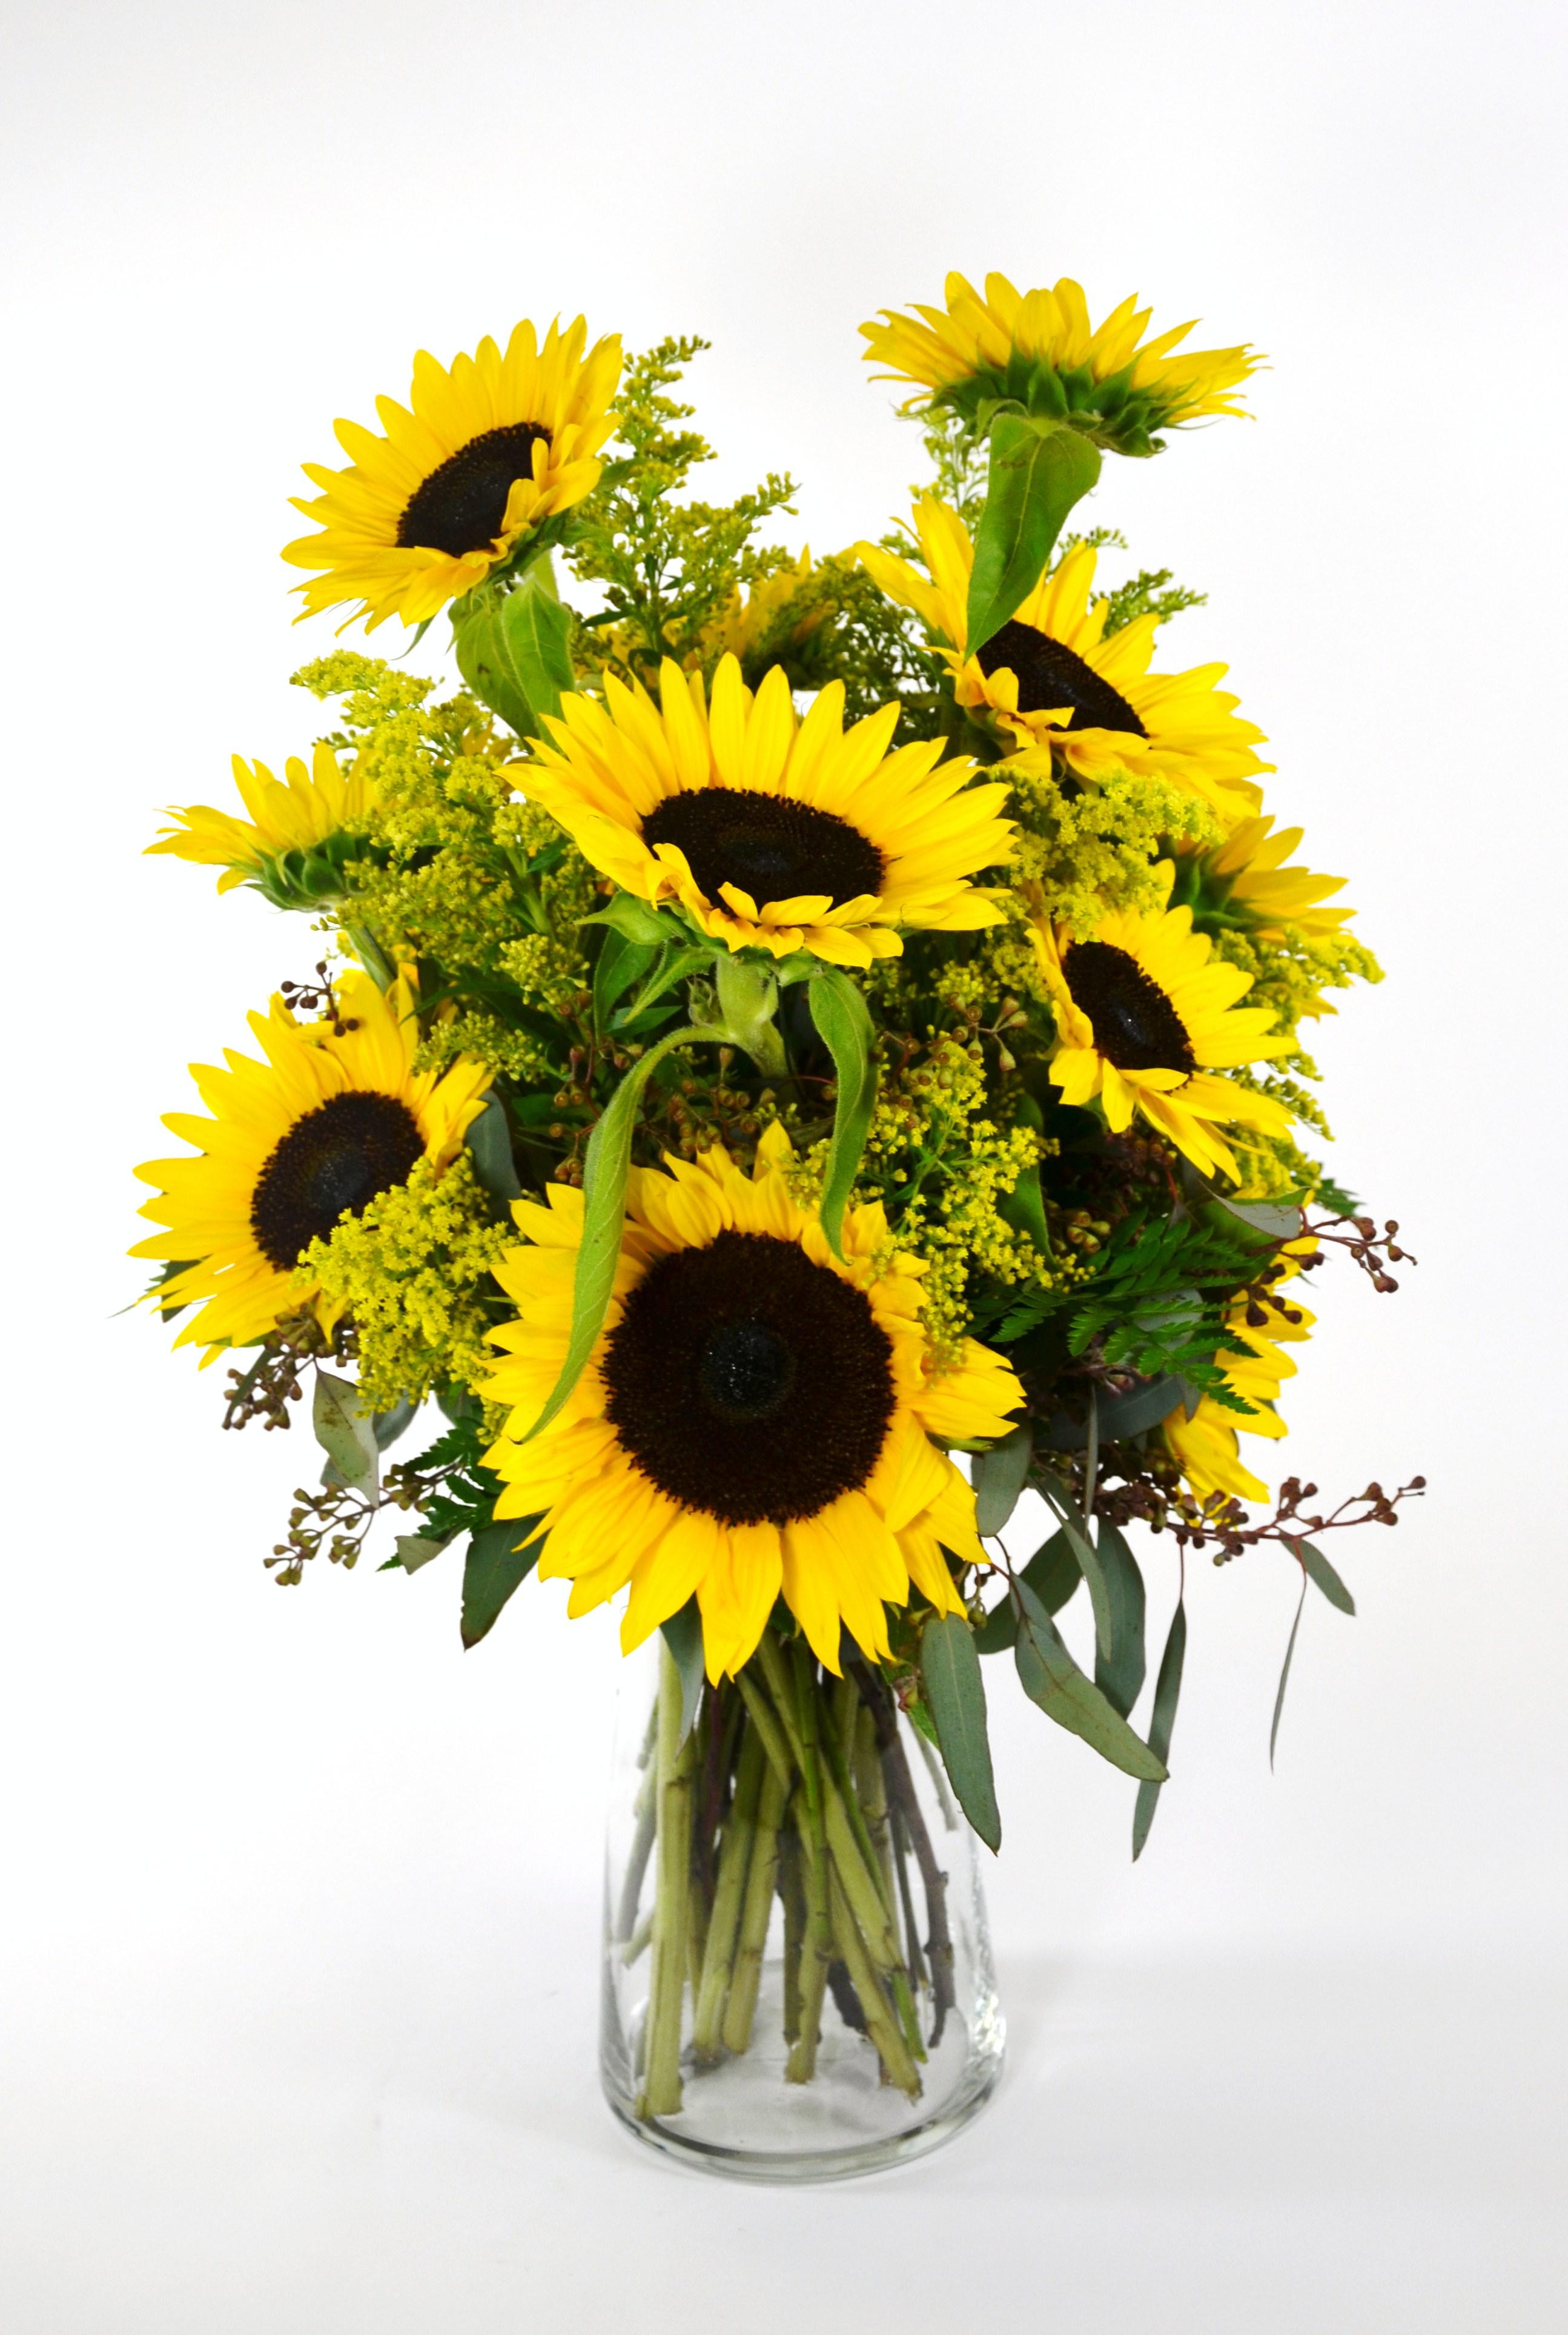 Mcshan Florist Inc 10311 Garland Rd Dallas Tx 75218